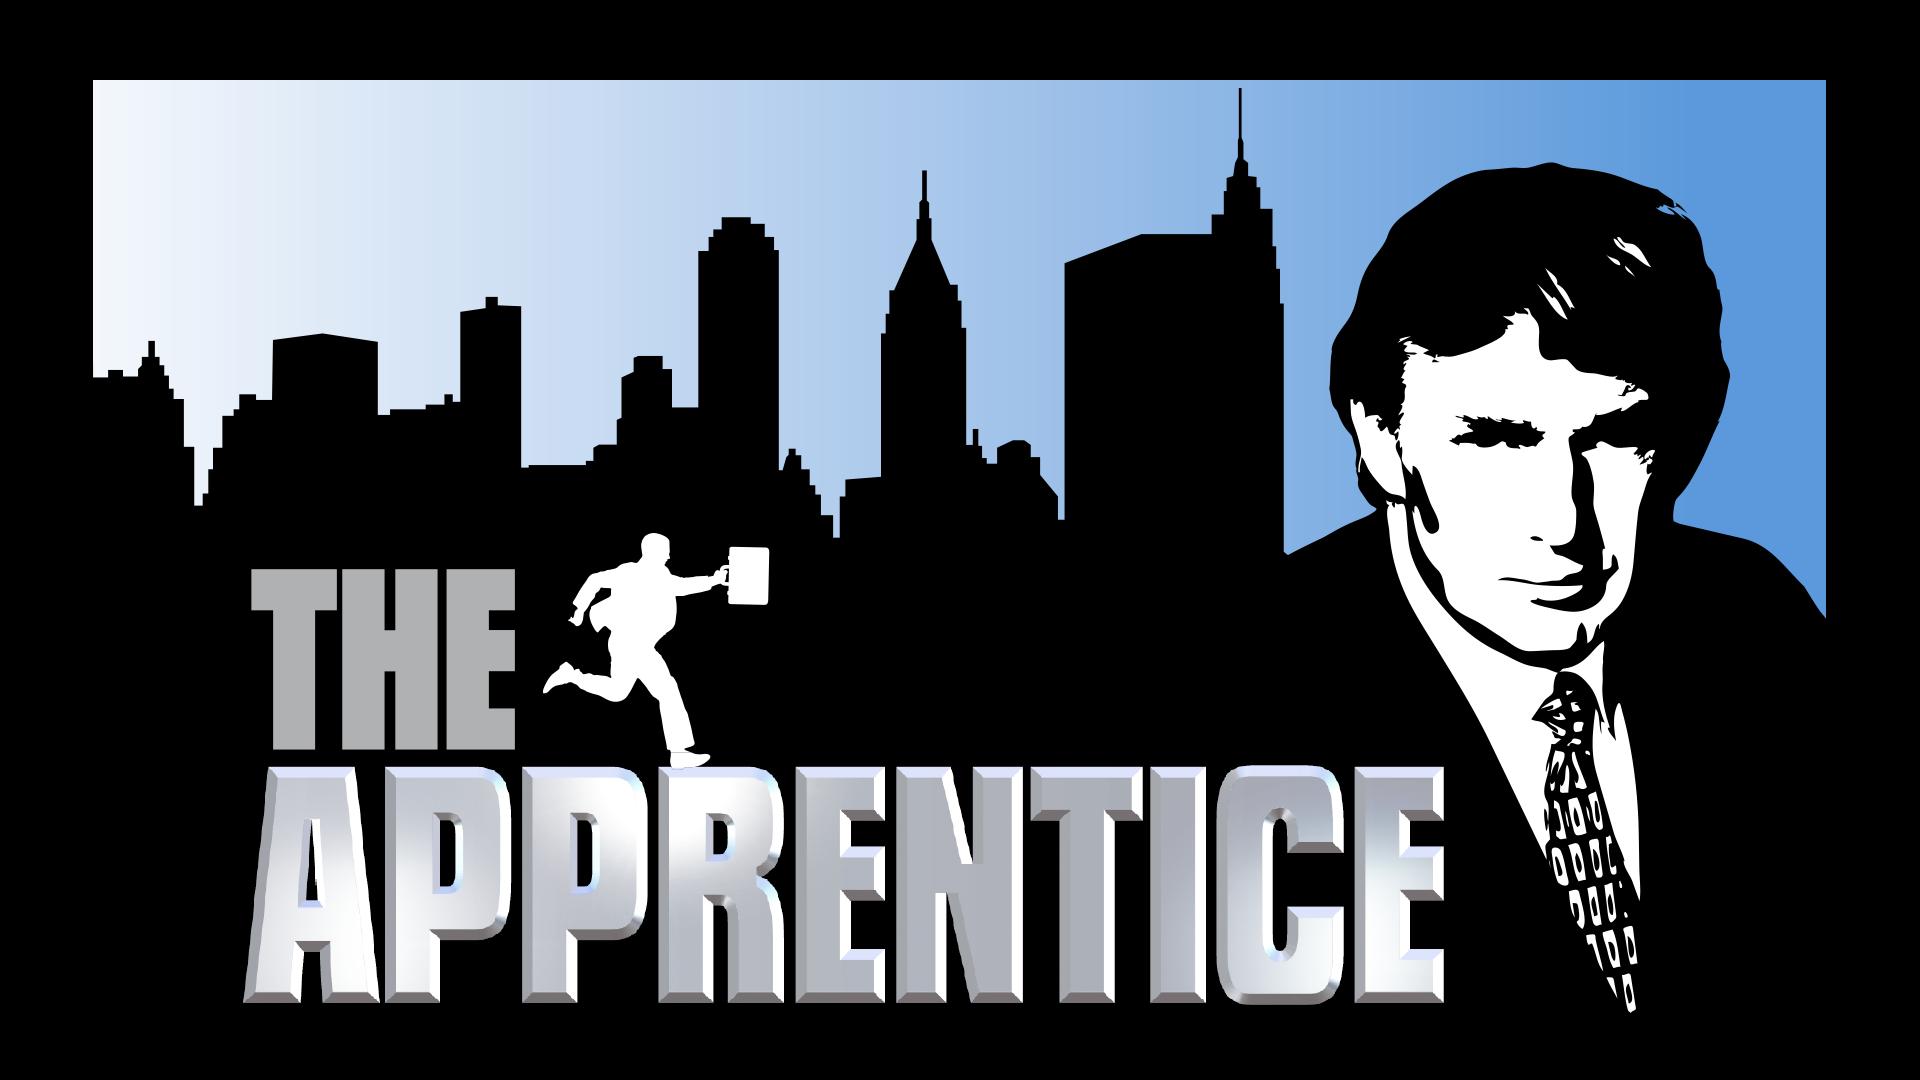 the apprentice   14 candidats  1 cdi  1 grande entreprise